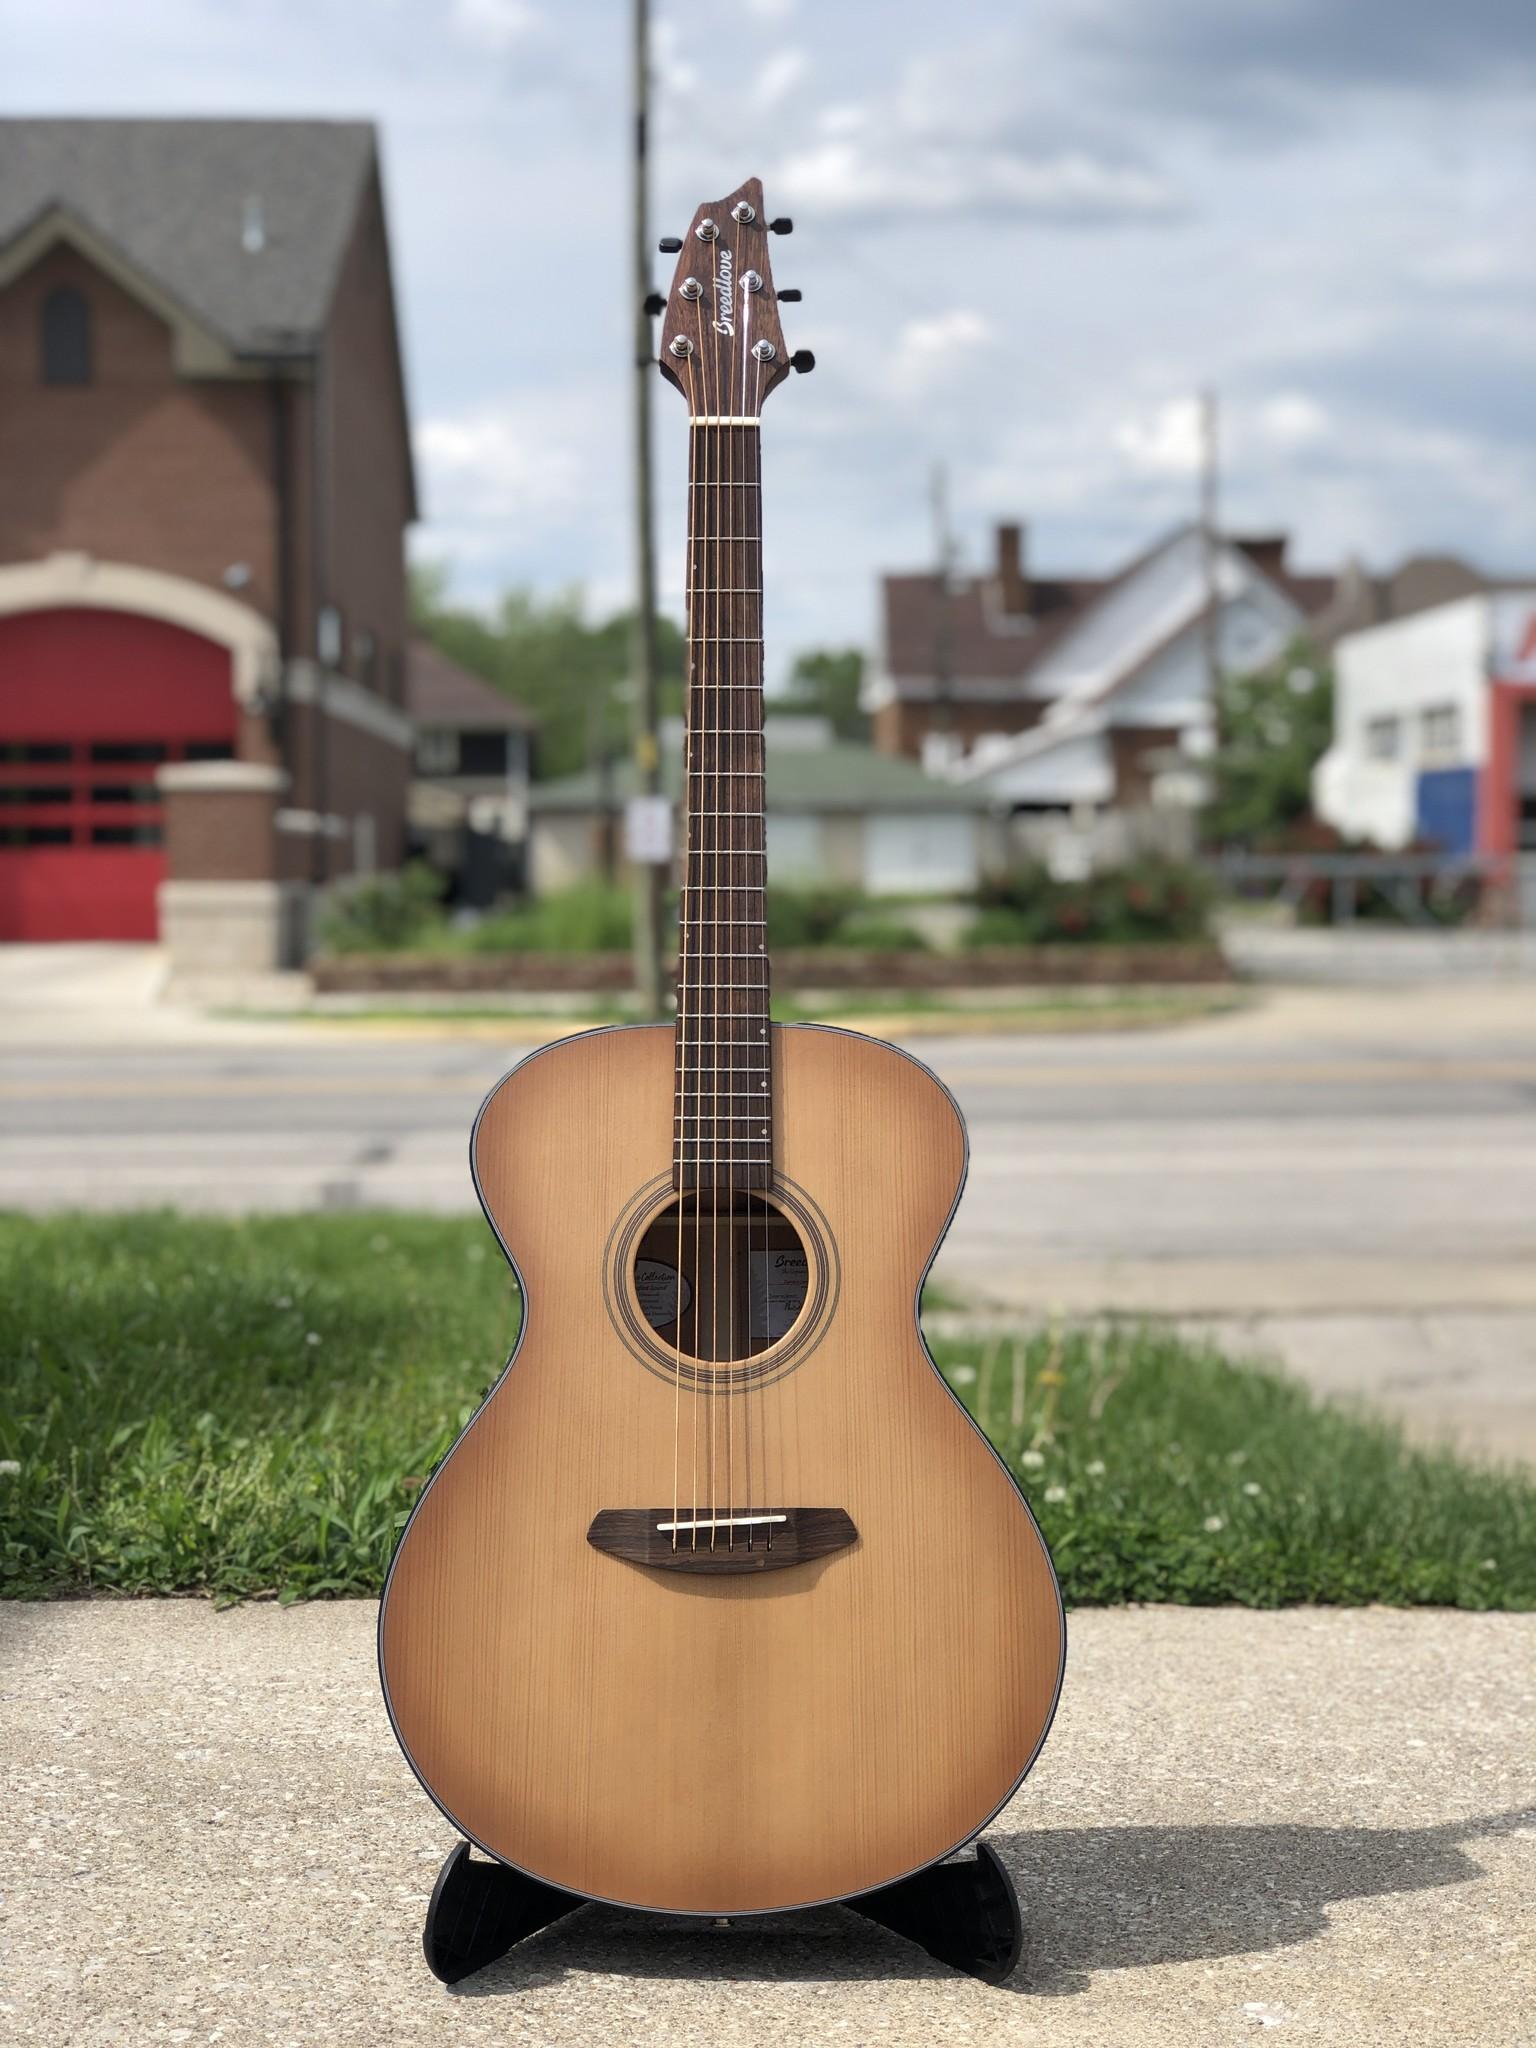 Breedlove Guitars Signature Concert Copper E Acoustic Electric-1